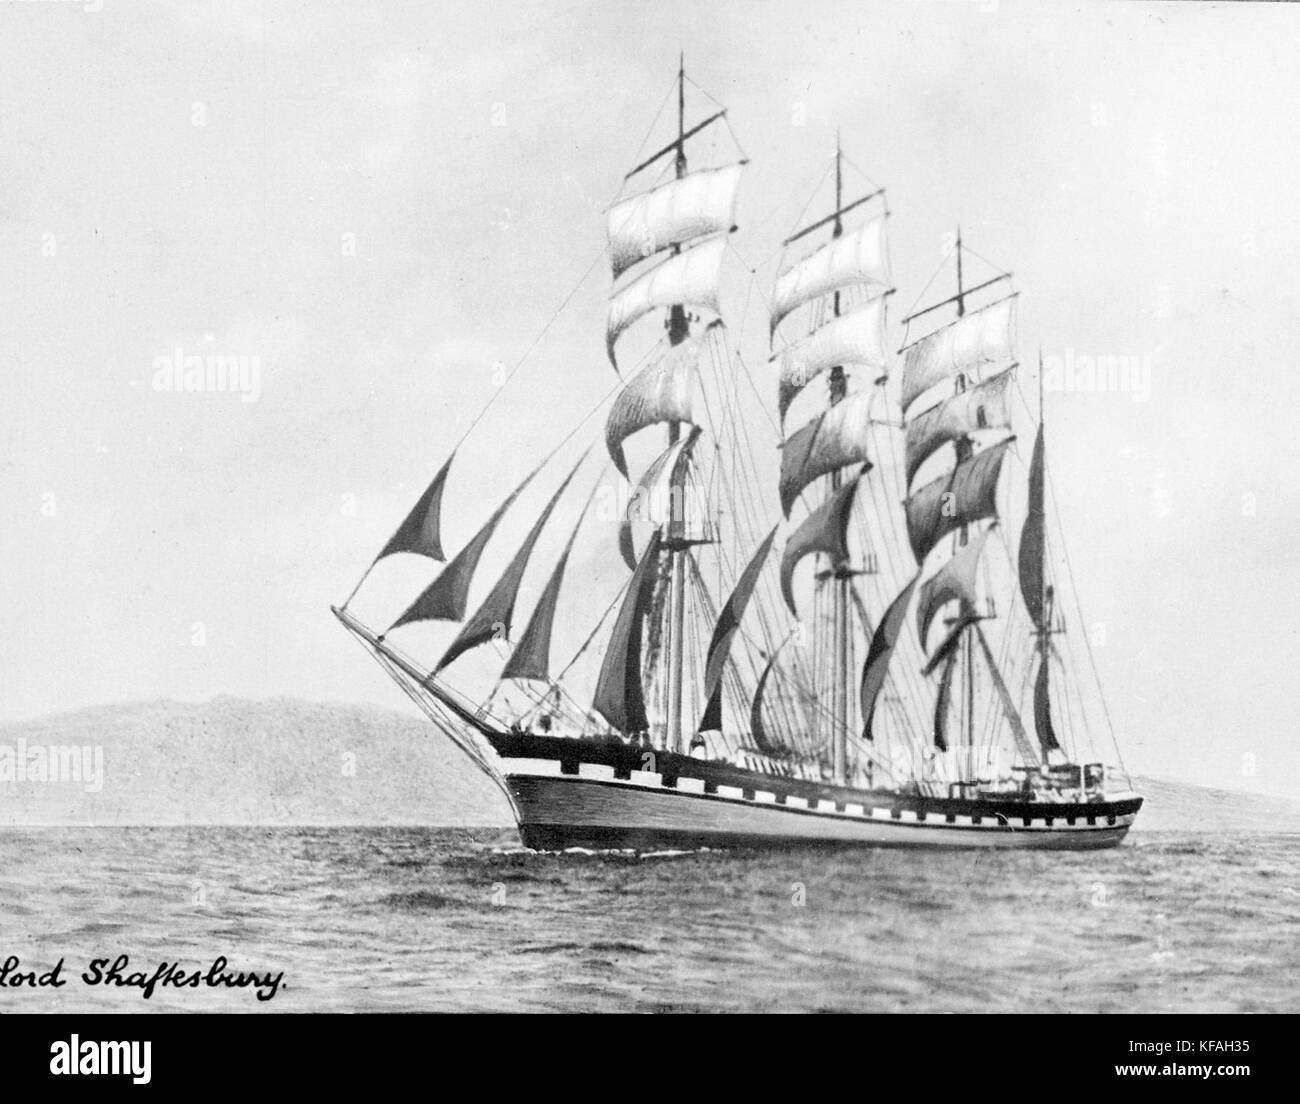 Lord Shaftesbury (ship, 1888)   SLV H99.220 3091 - Stock Image